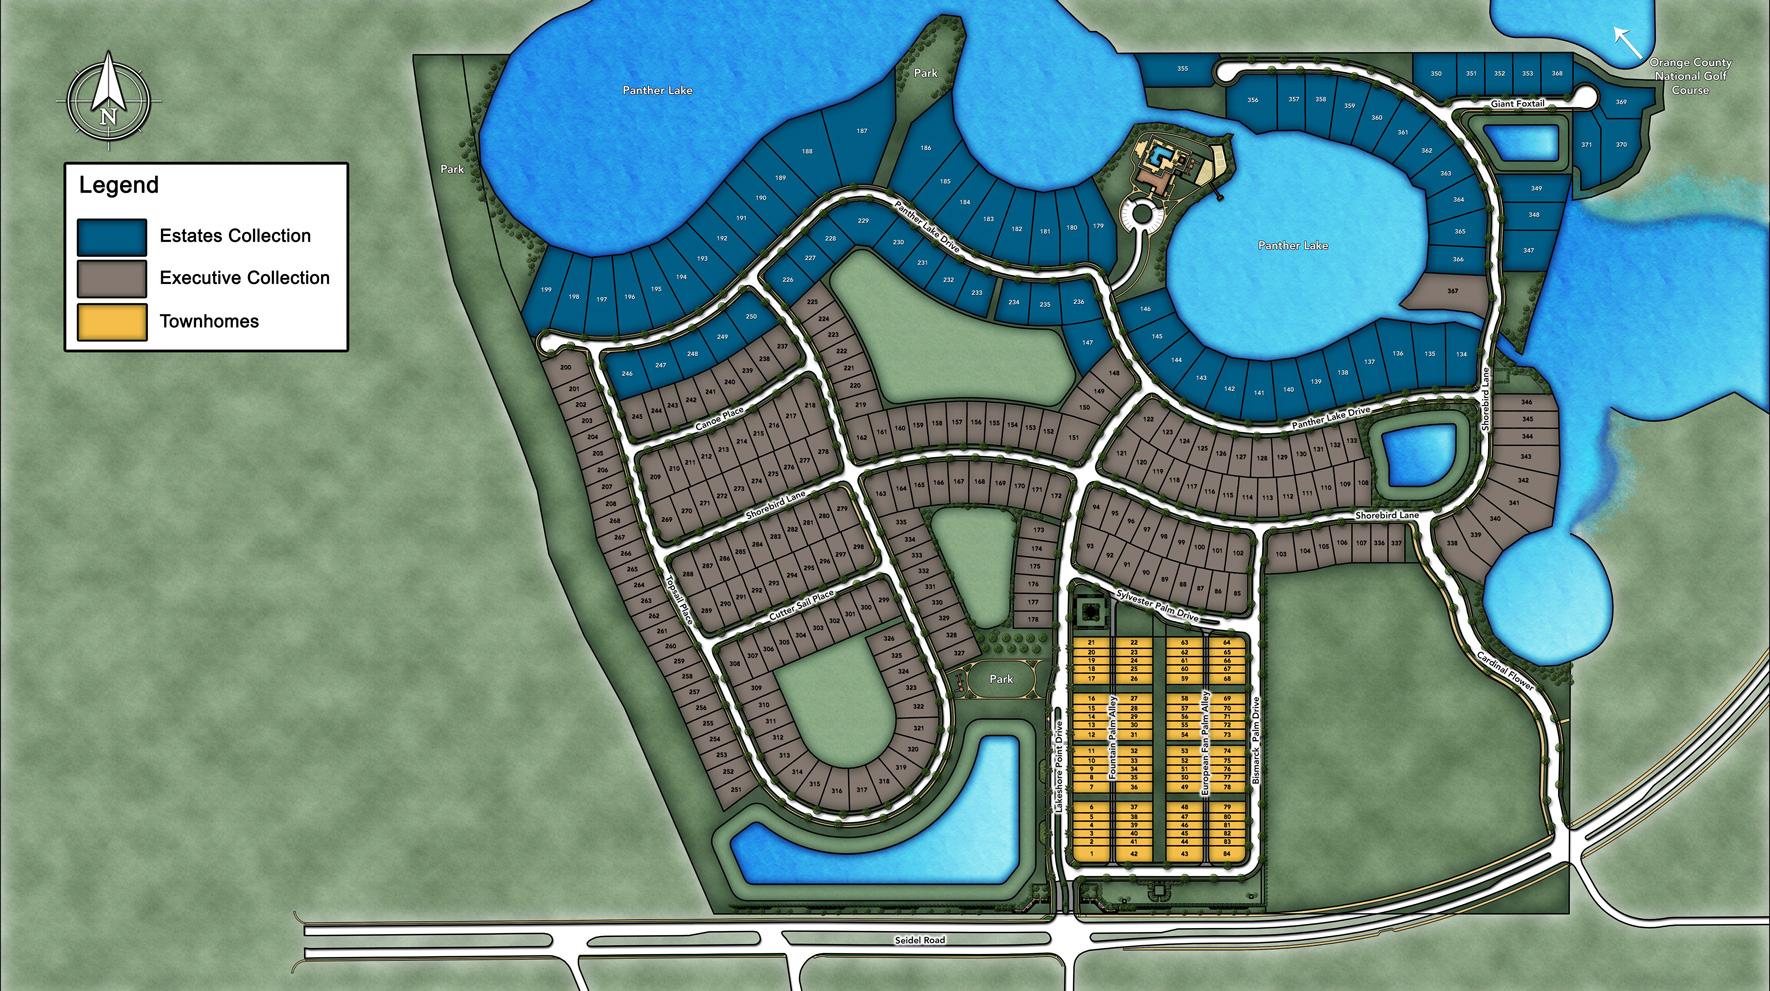 Lakeshore - Executive Collection Site Plan I